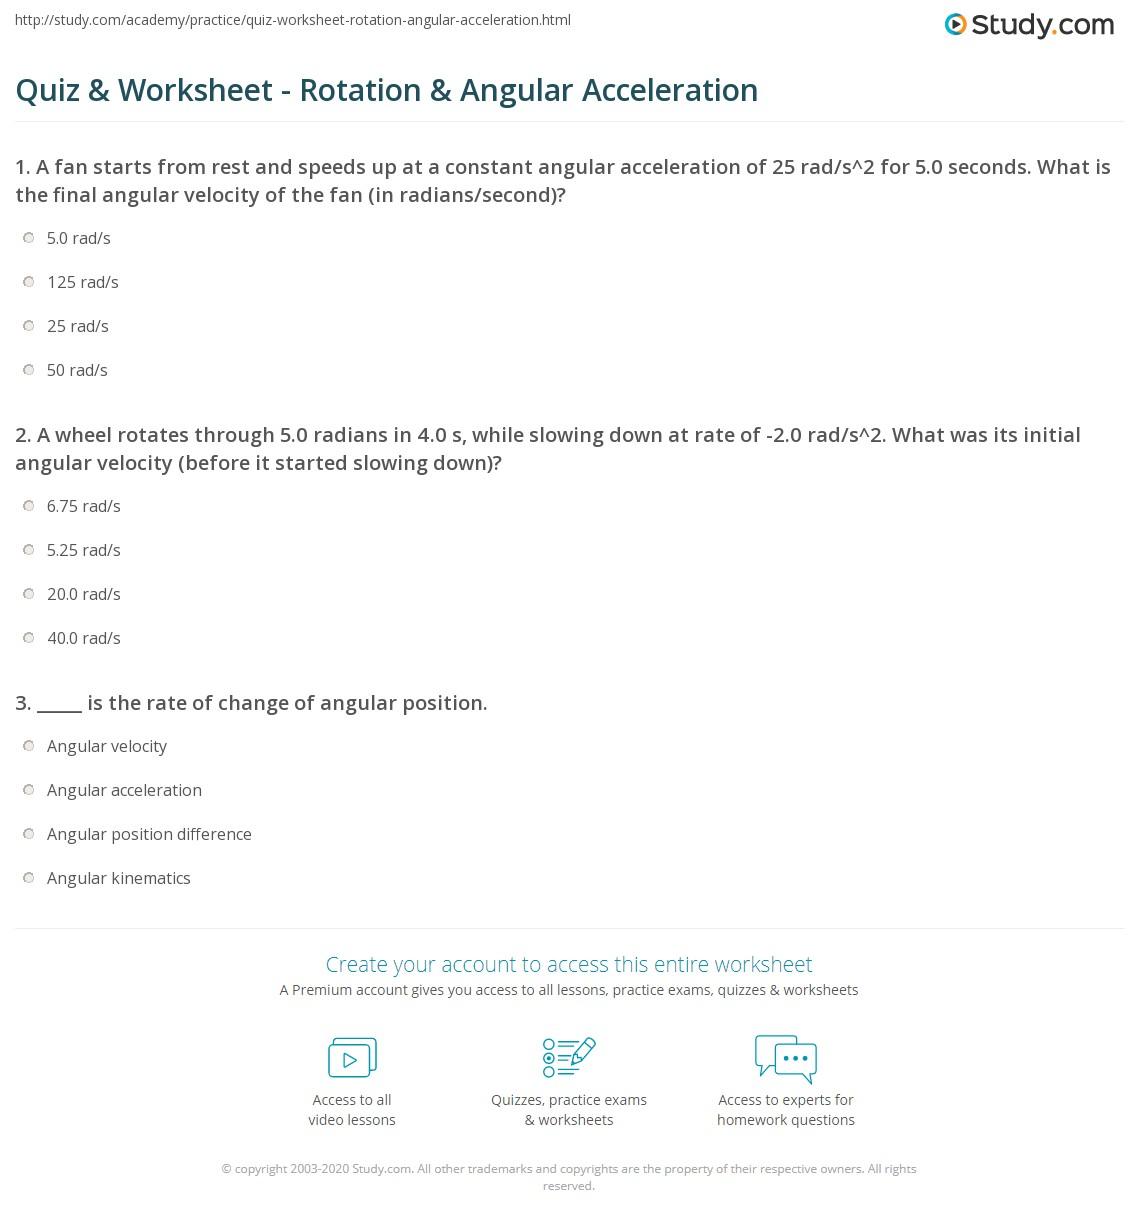 Quiz & Worksheet - Rotation & Angular Acceleration | Study.com